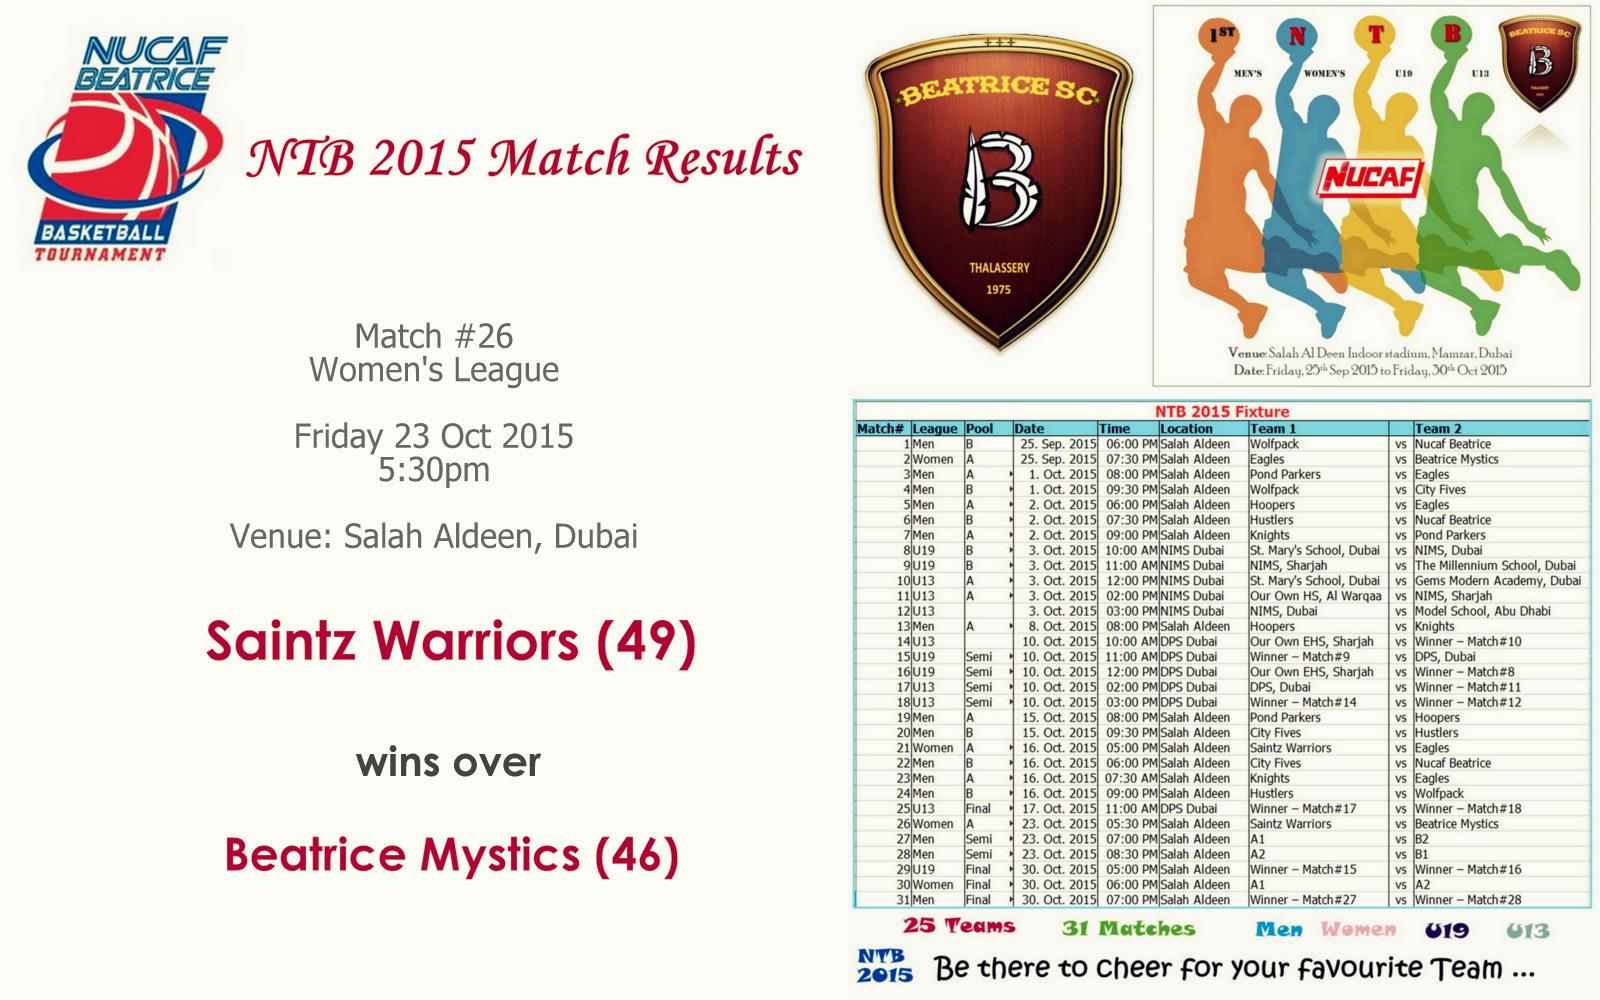 NTB 2015 – Match #26 | Saintz Warriors (49) Vs Beatrice Mystics (46)